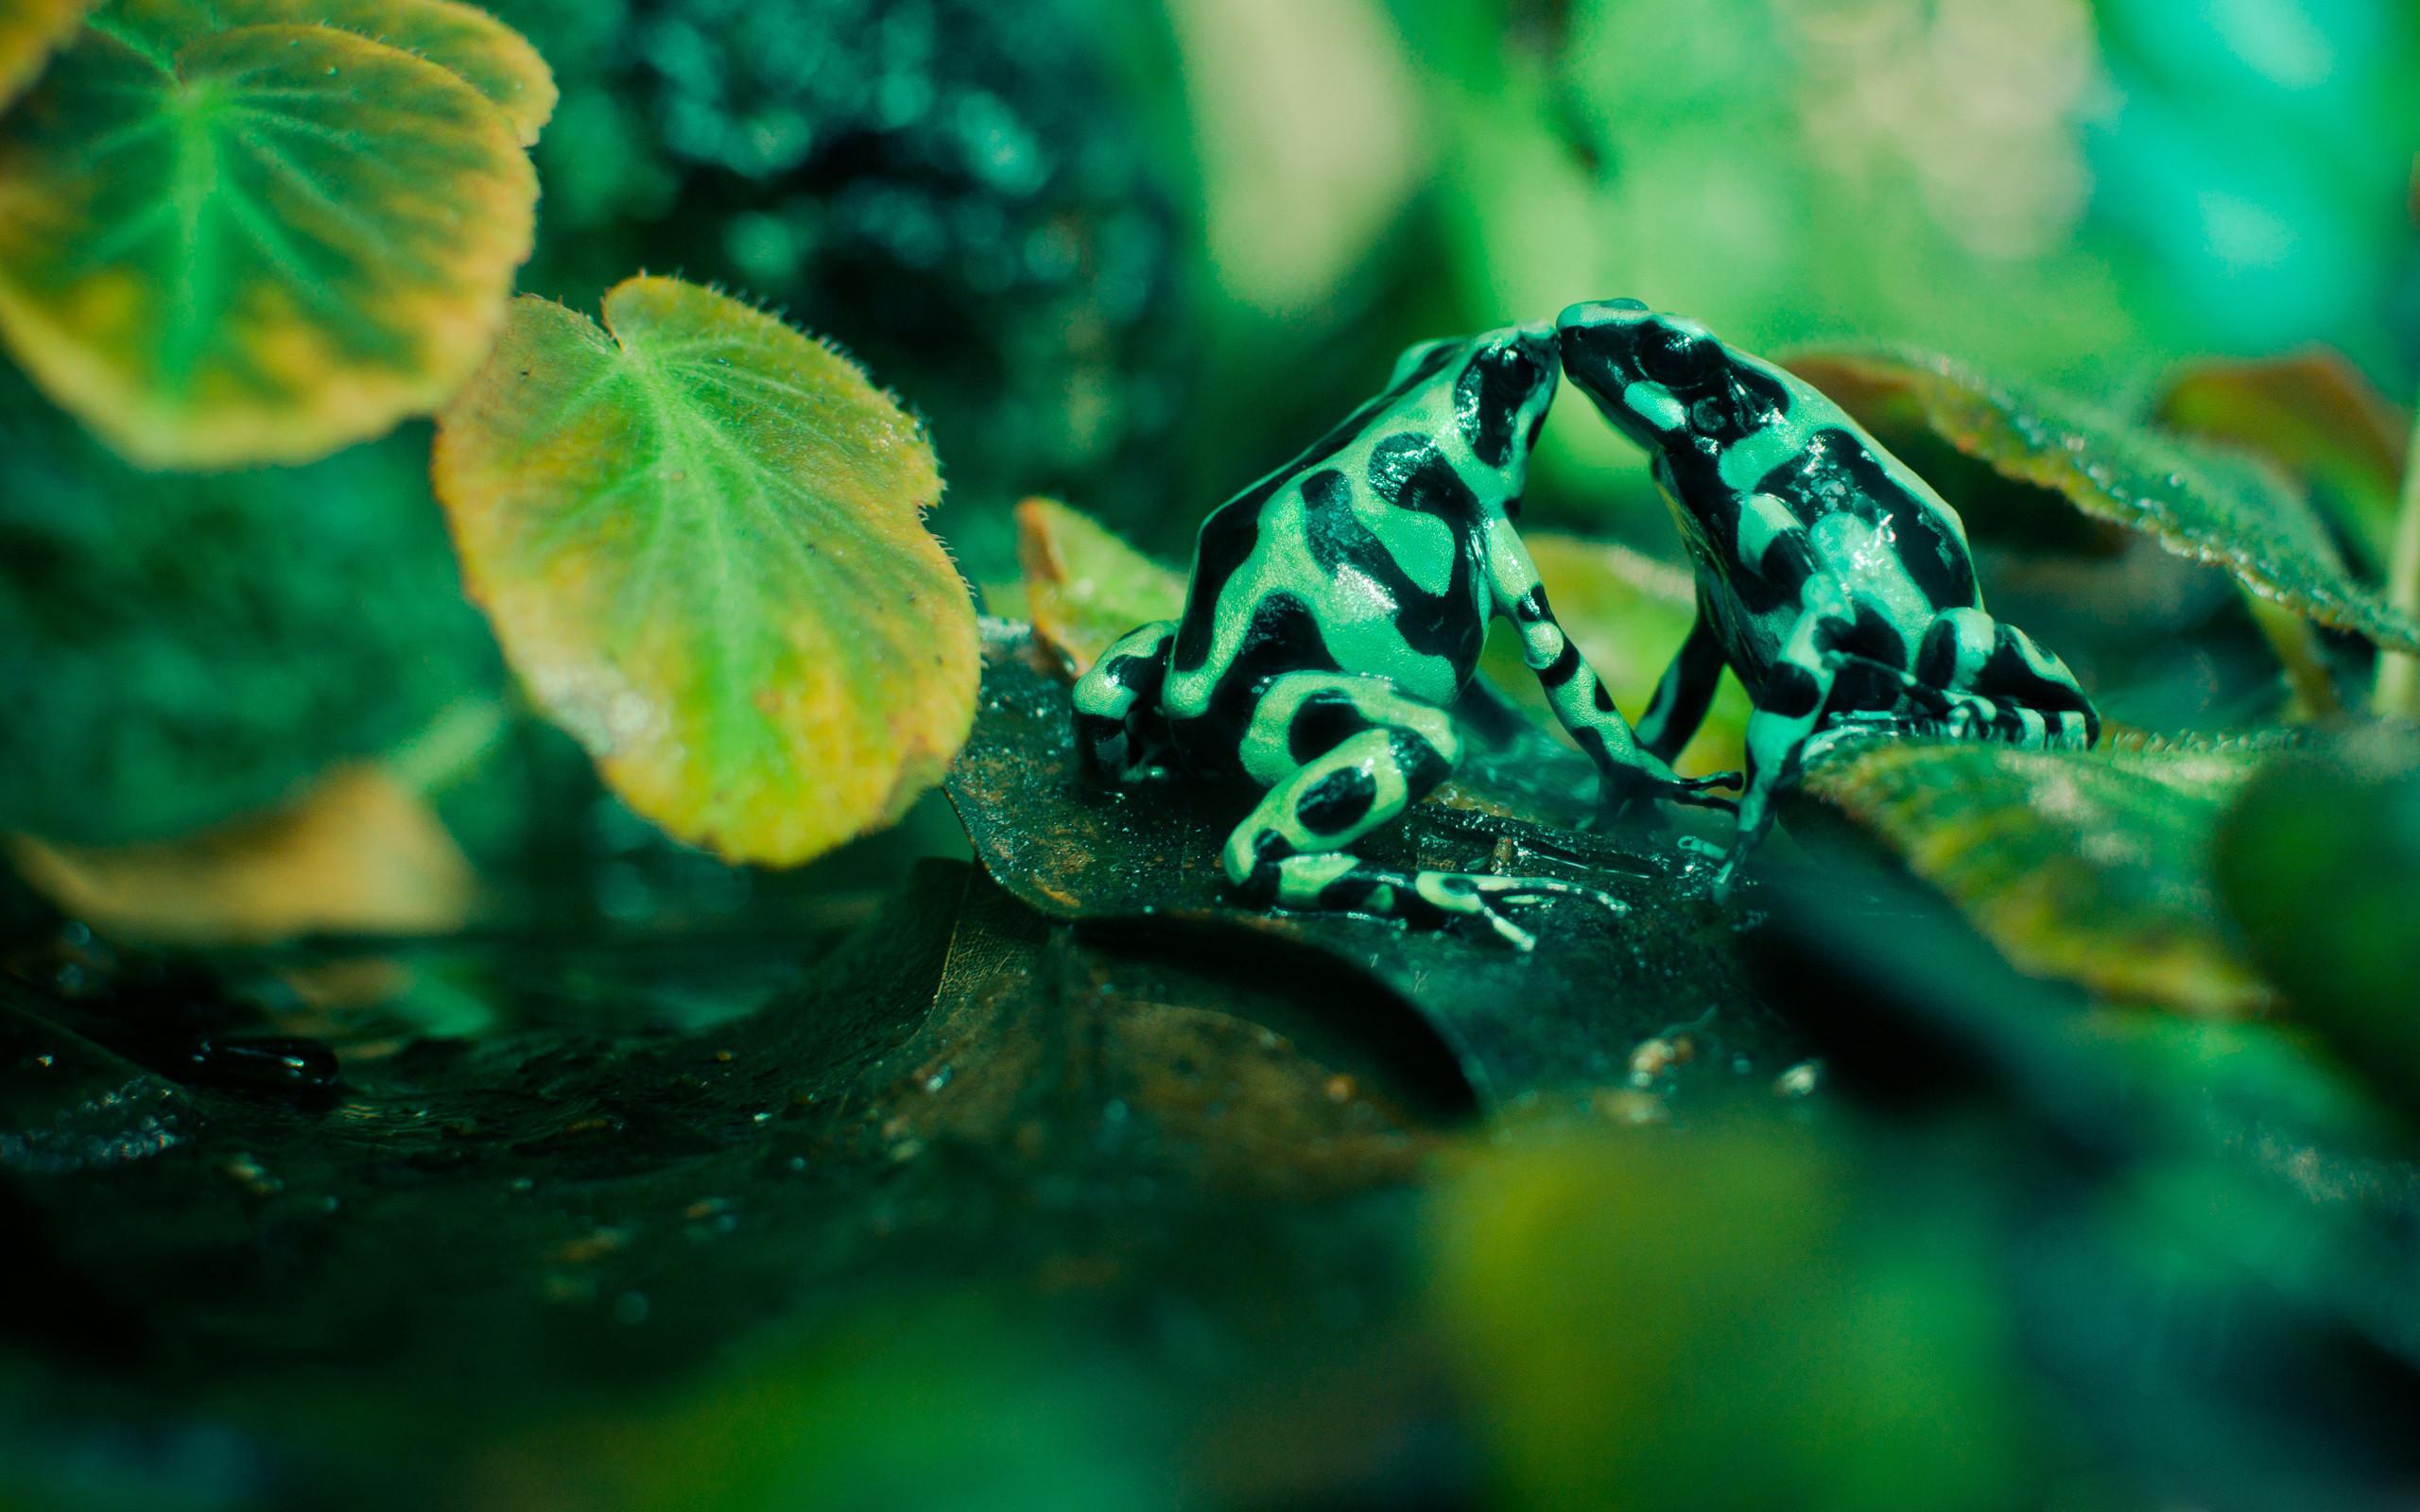 Cute Frog Wallpaper Desktop Background